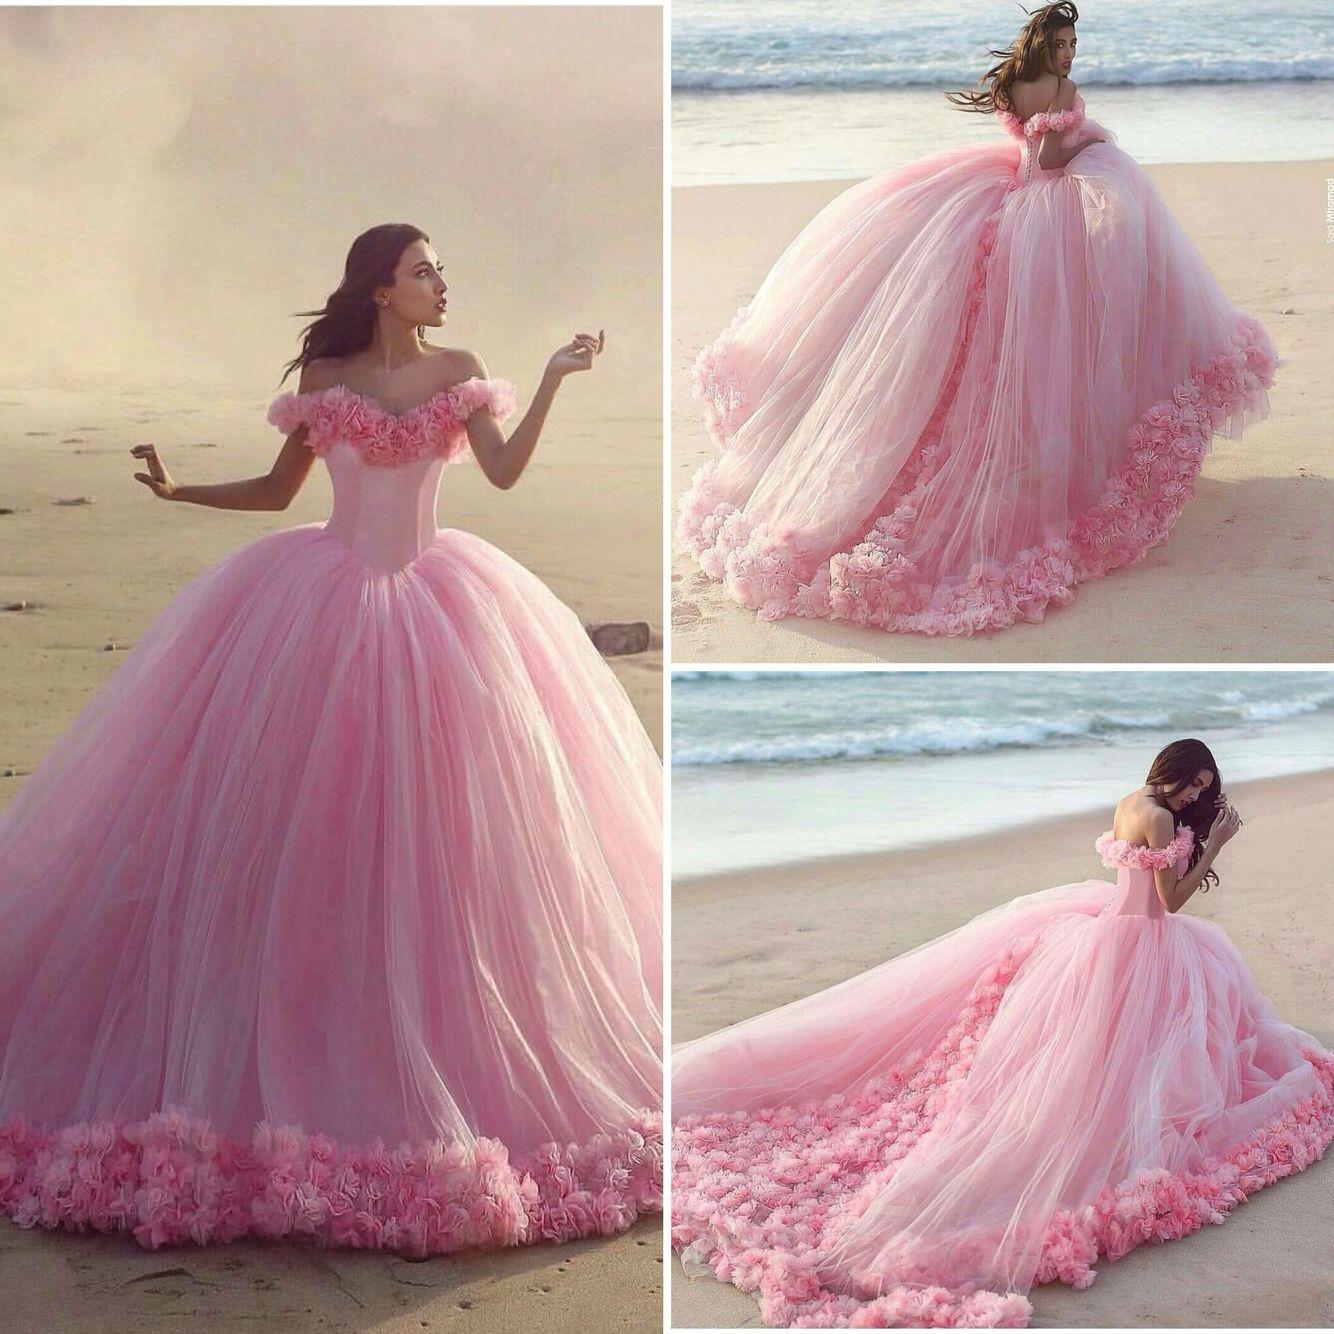 Pin de Valerie Almaraz en Dress | Pinterest | Fiestas de xv años ...